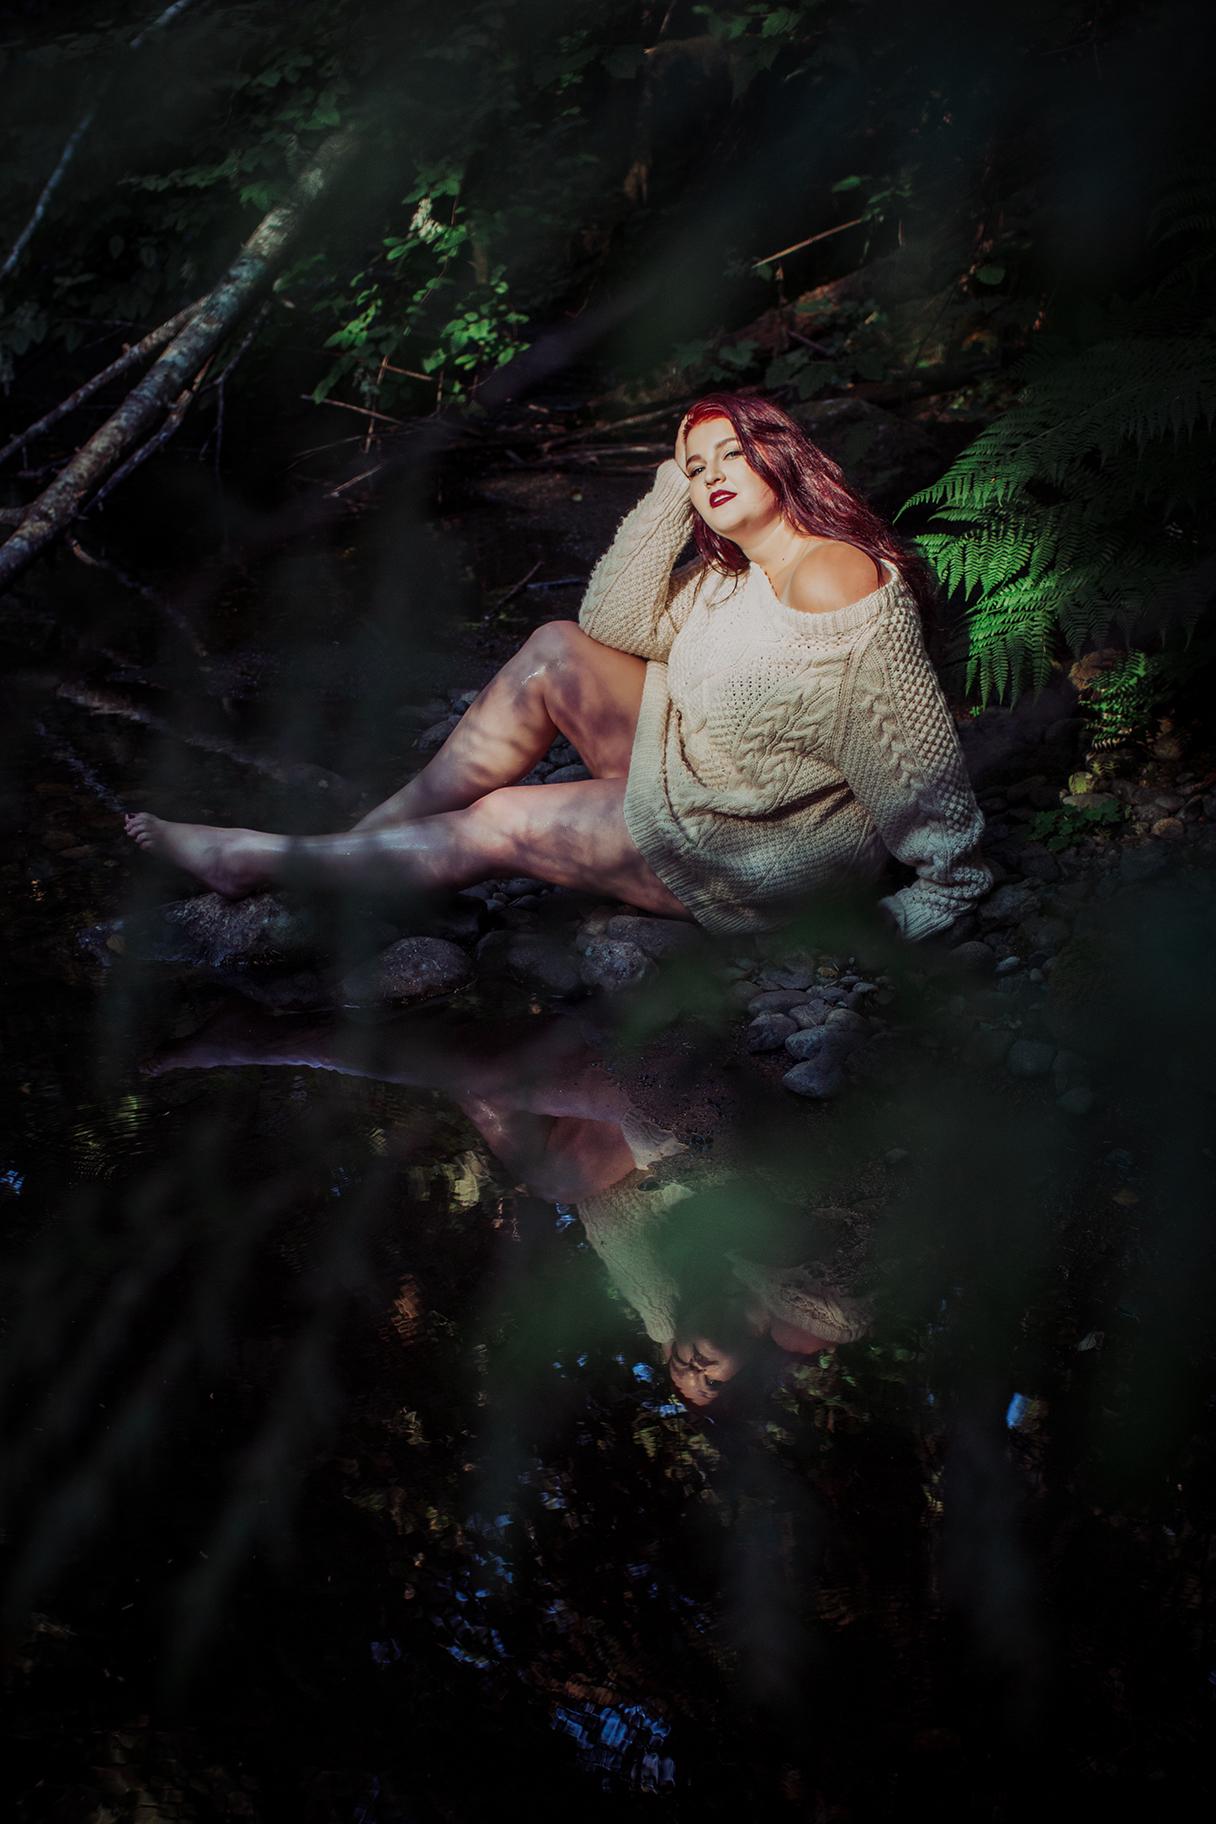 Victoria-BC-Outdoor-Boudoir-Moss-Photography-61.jpg